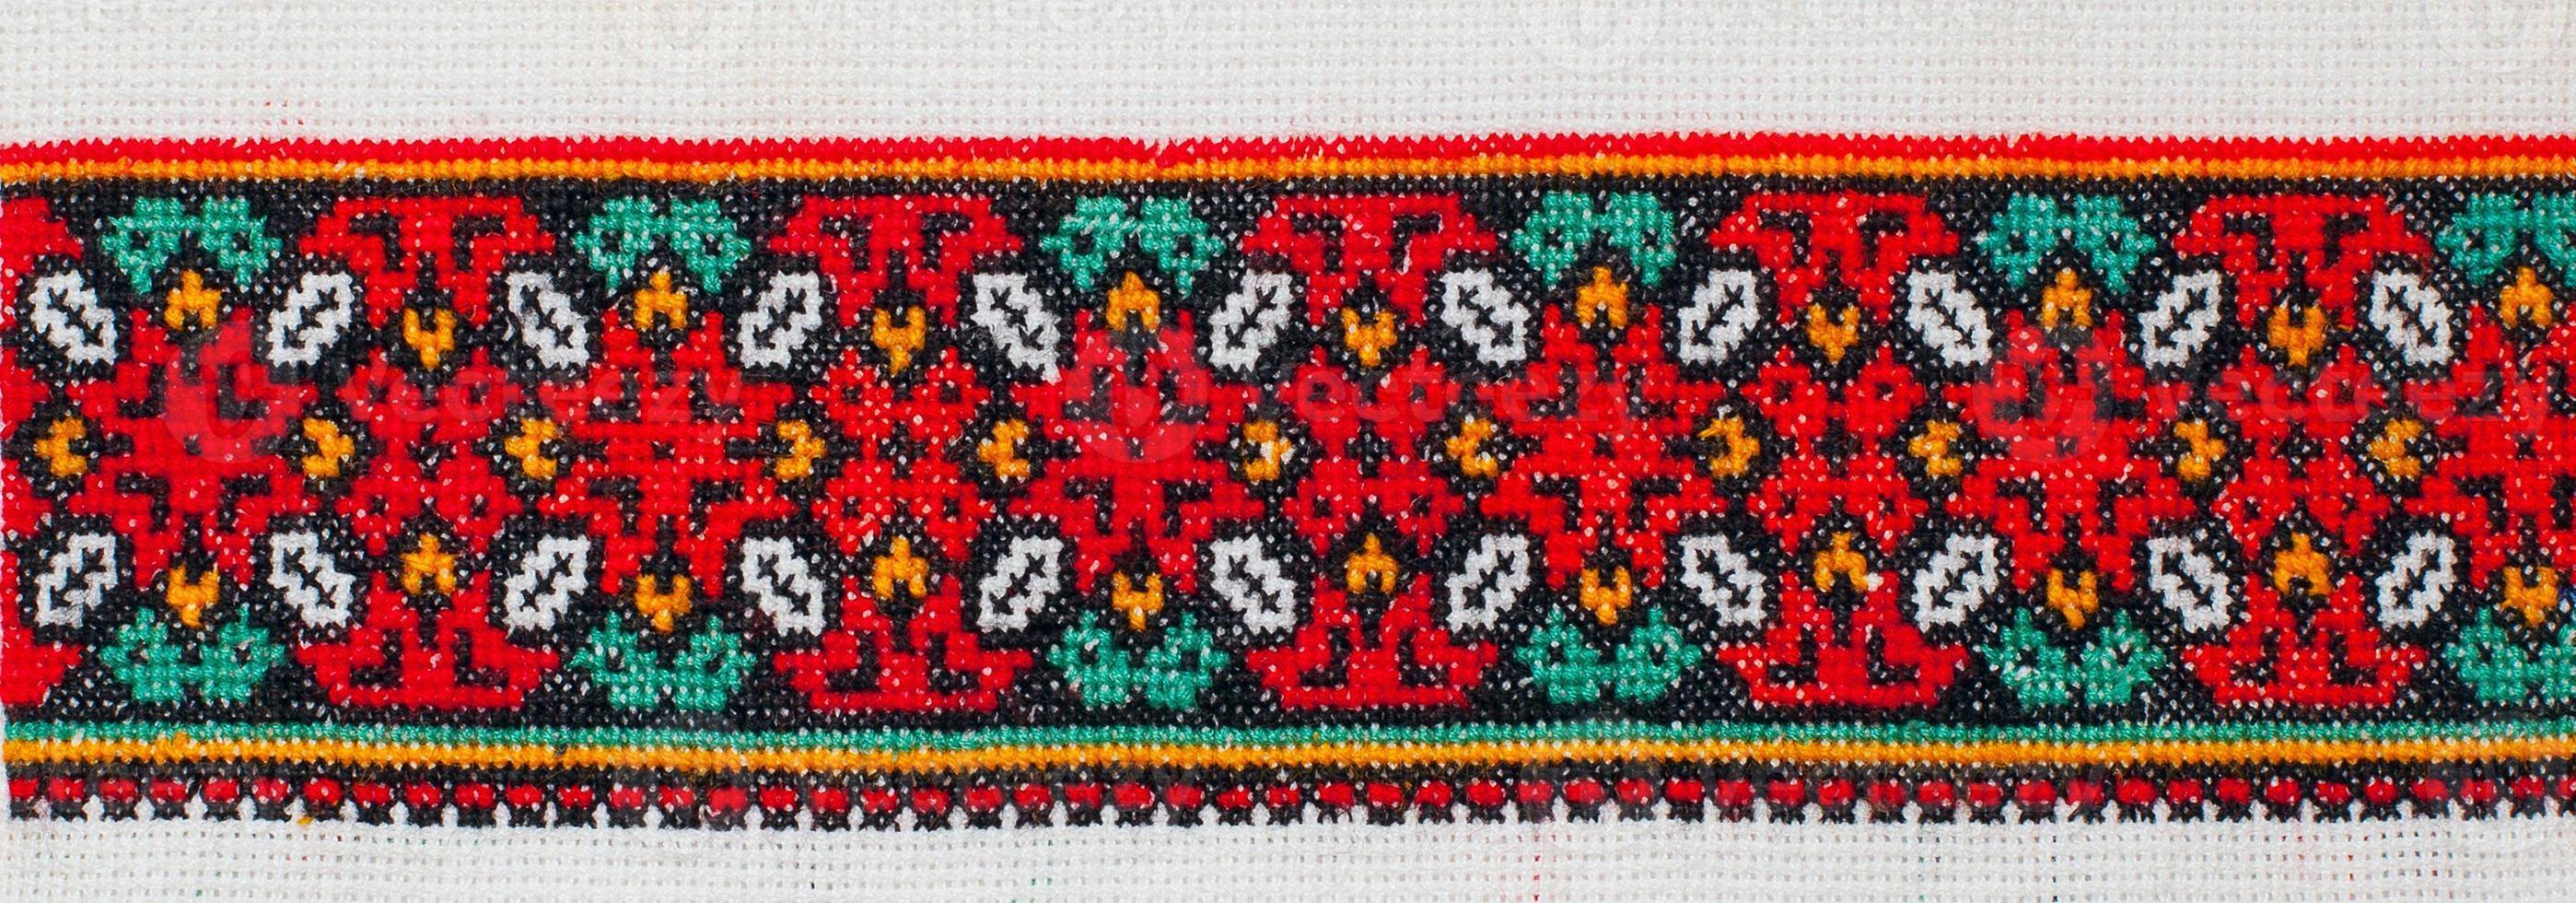 embroidered cross-stitch pattern. ukrainian ethnic ornament photo